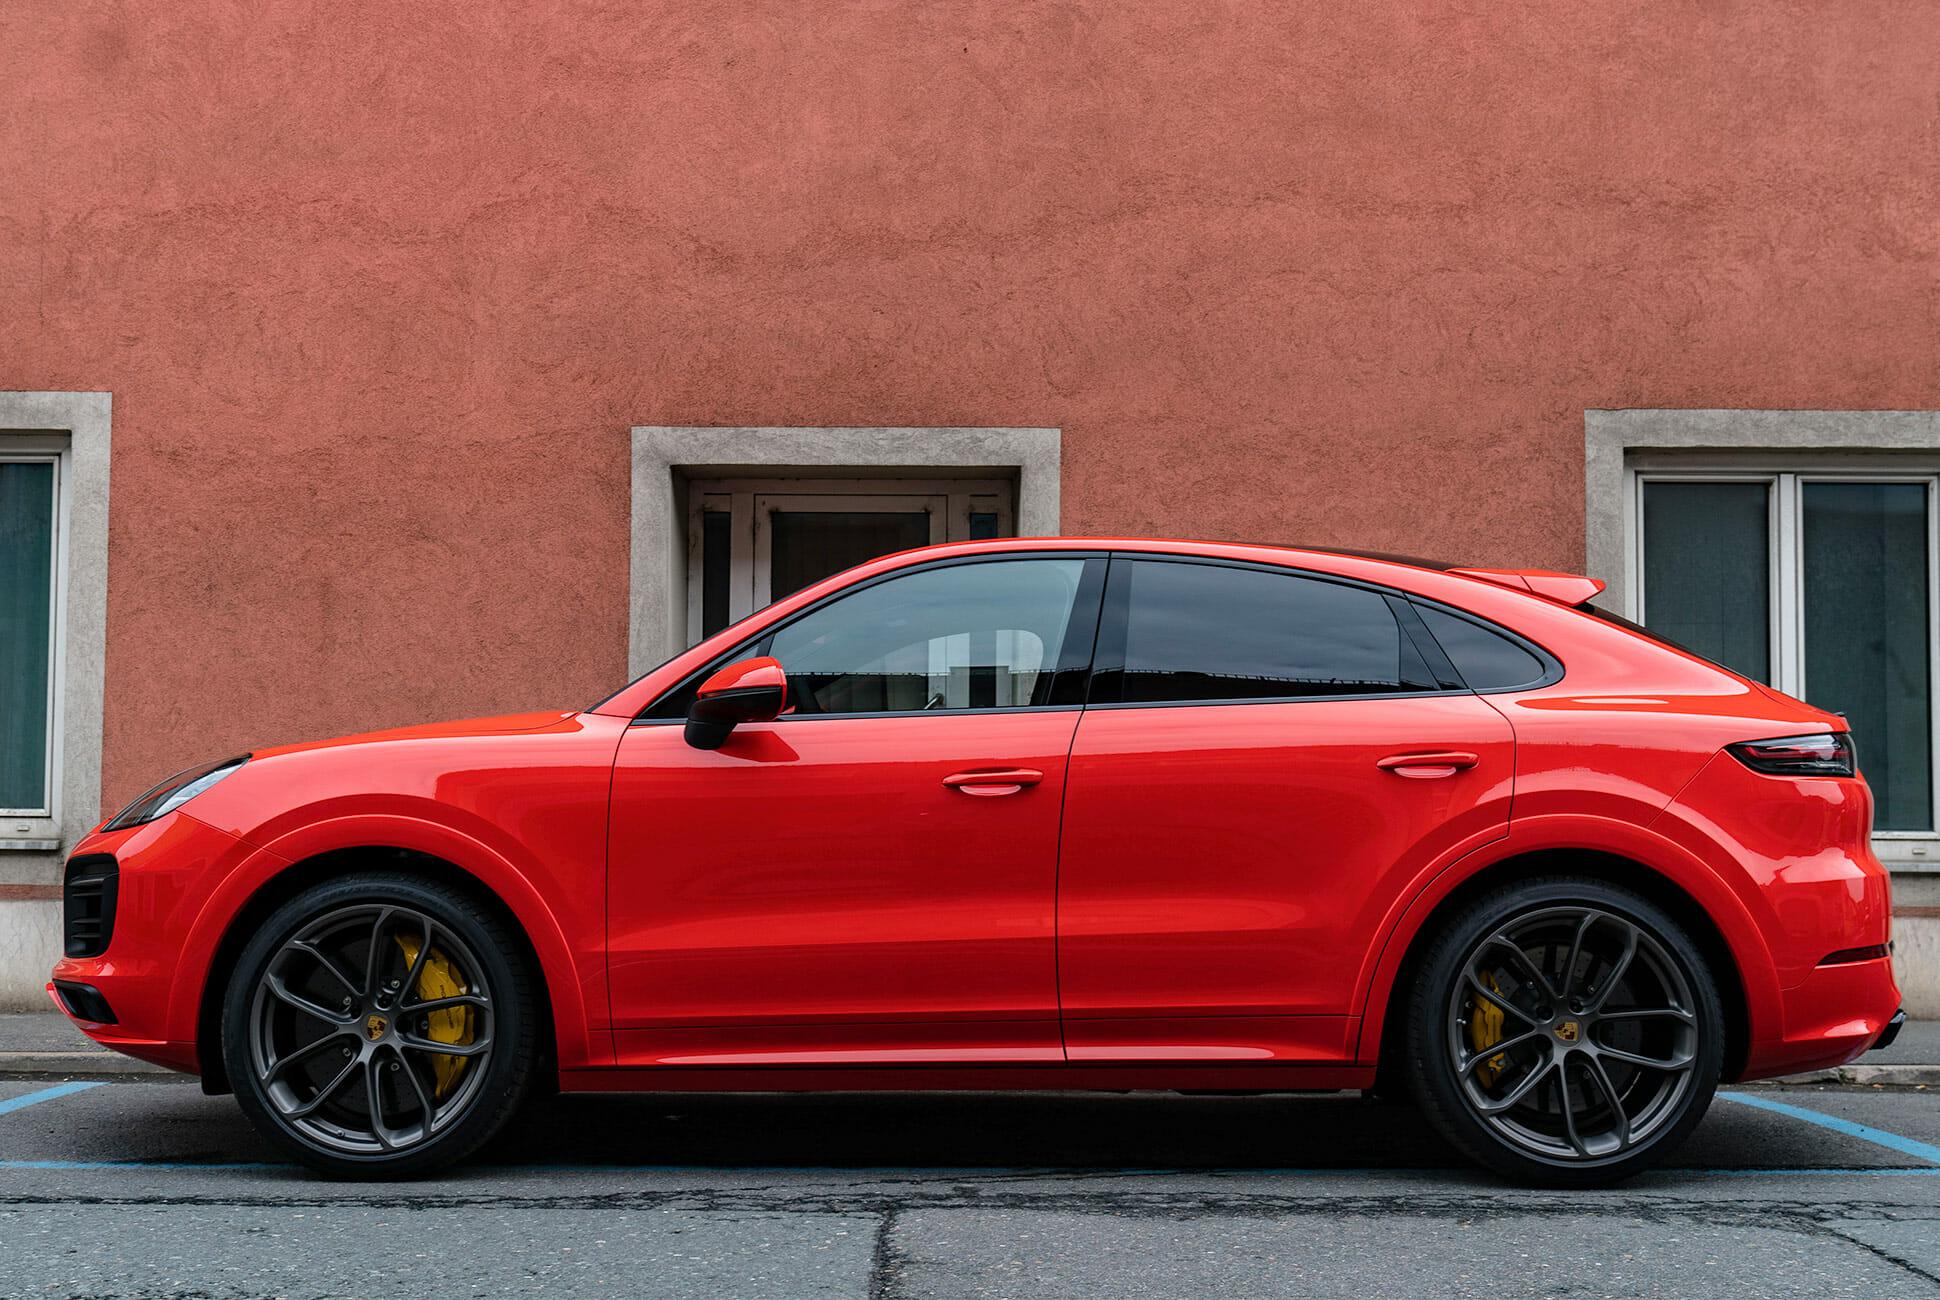 2020-Porsche-Cayenne-Coupe-Review-gear-patrol-slide-2